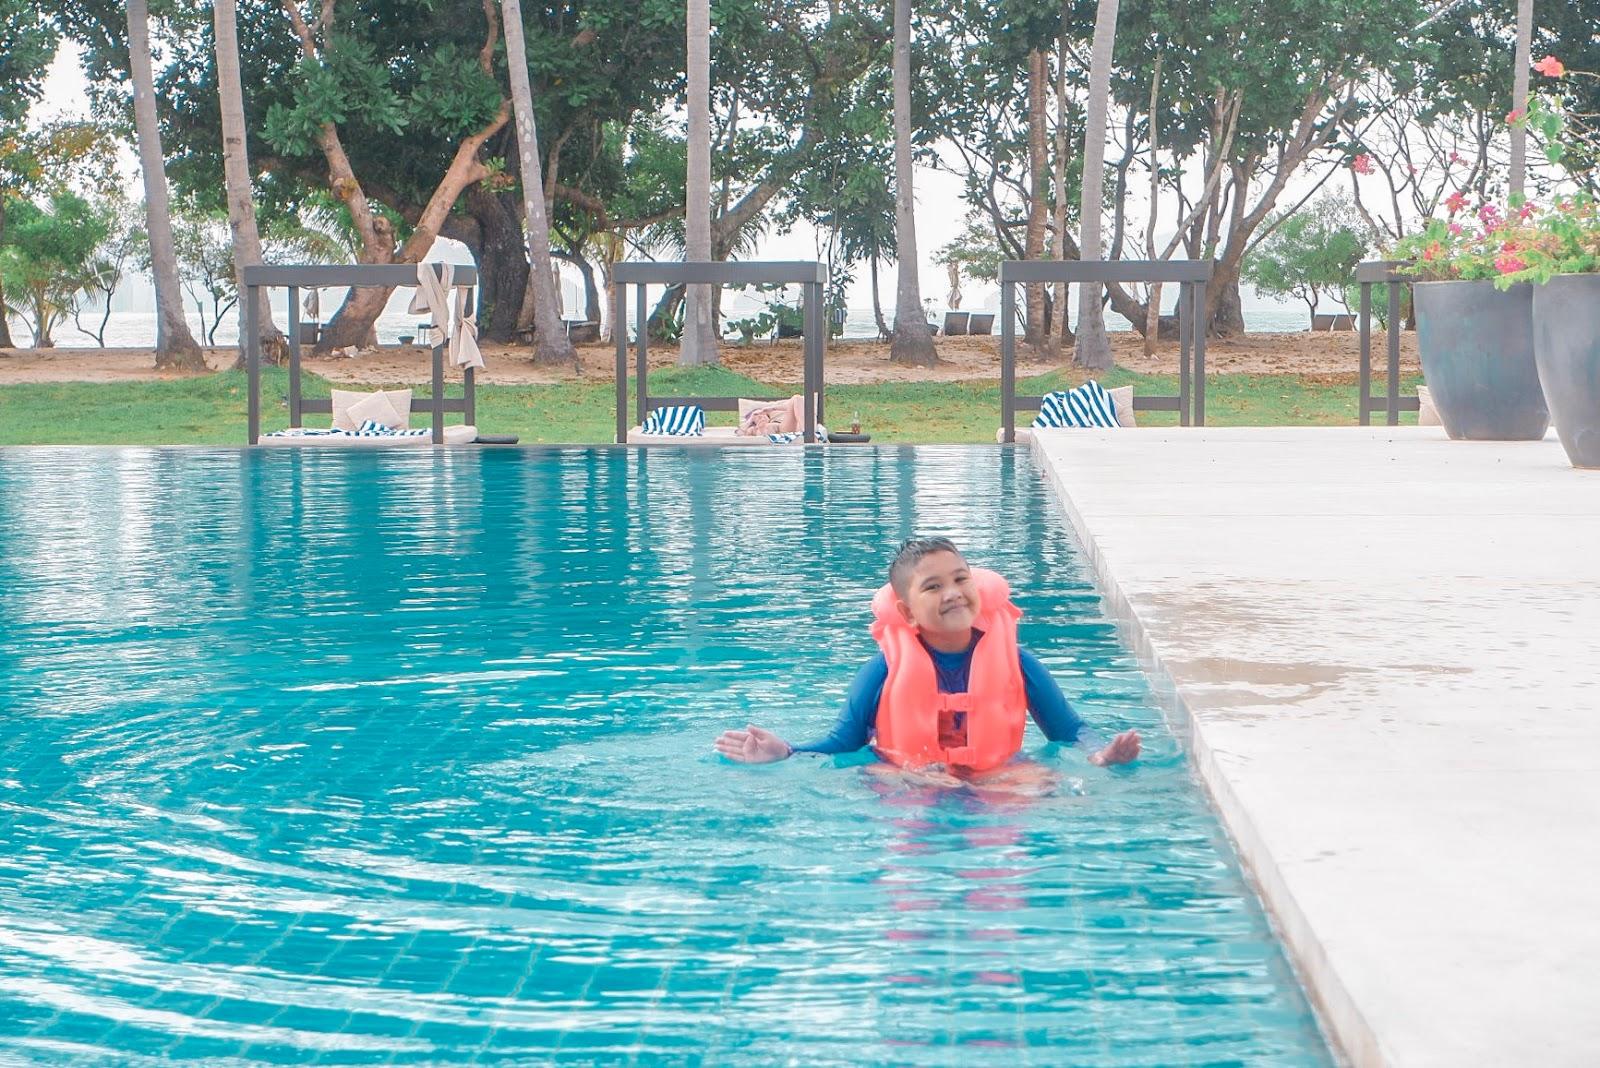 Staycation Series: Overnight Stay at Seda Lio in El Nido, Palawan